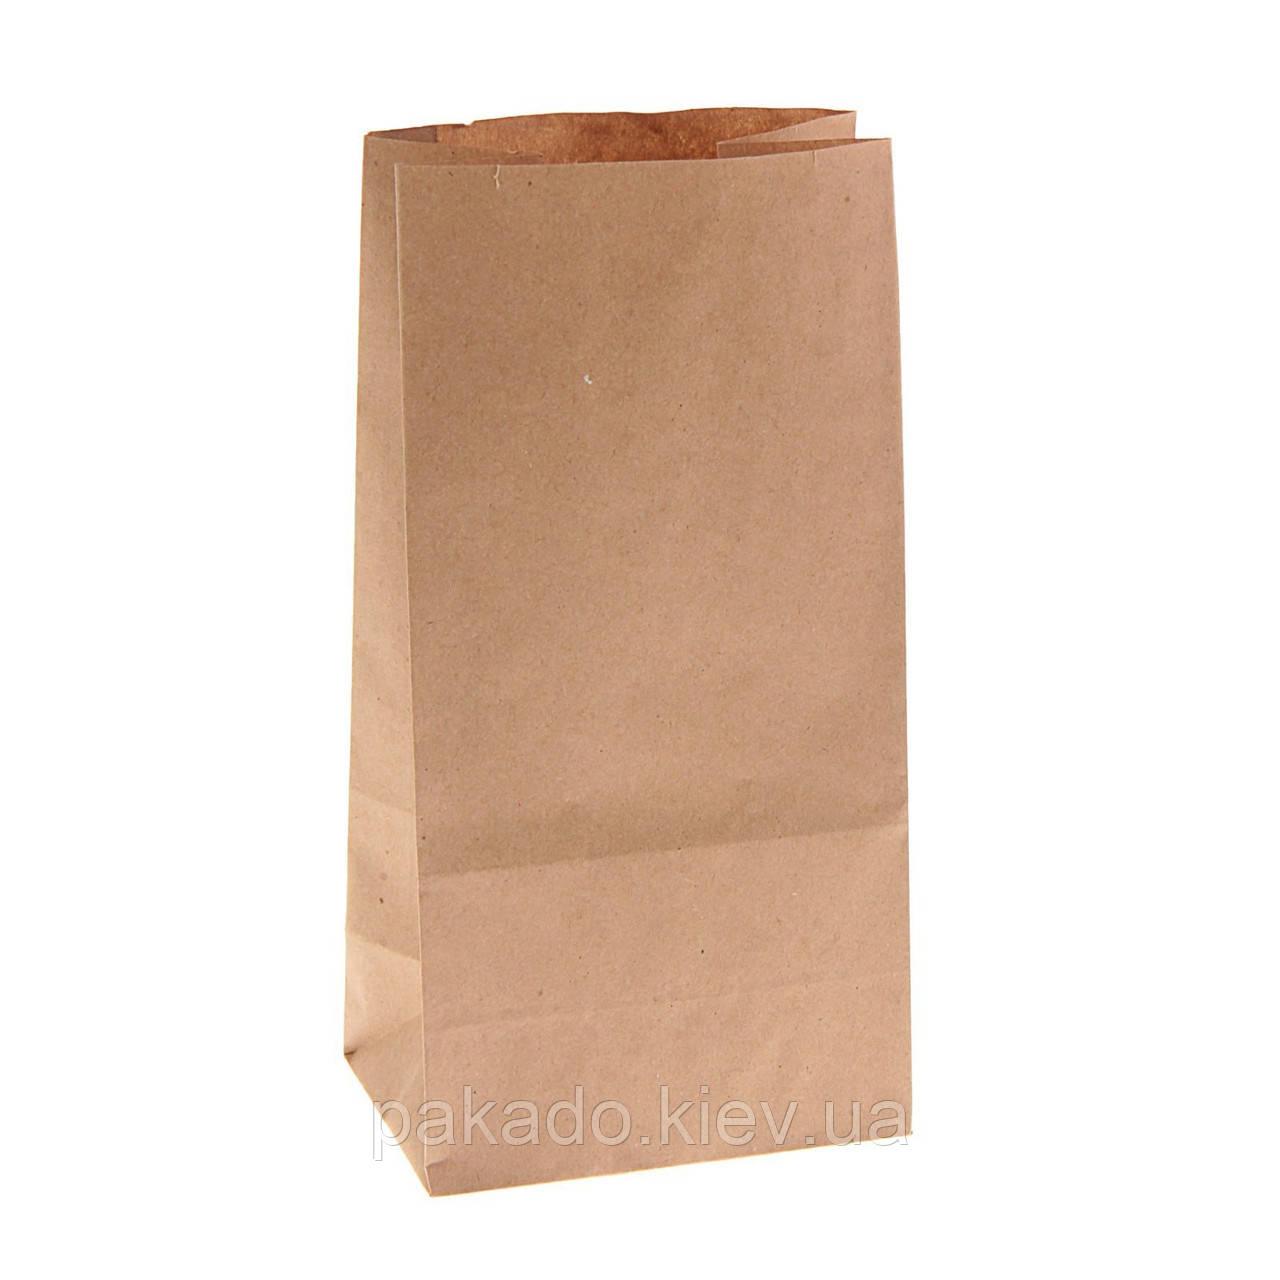 Бумажный пакет с дном 320х160х420 Бурый